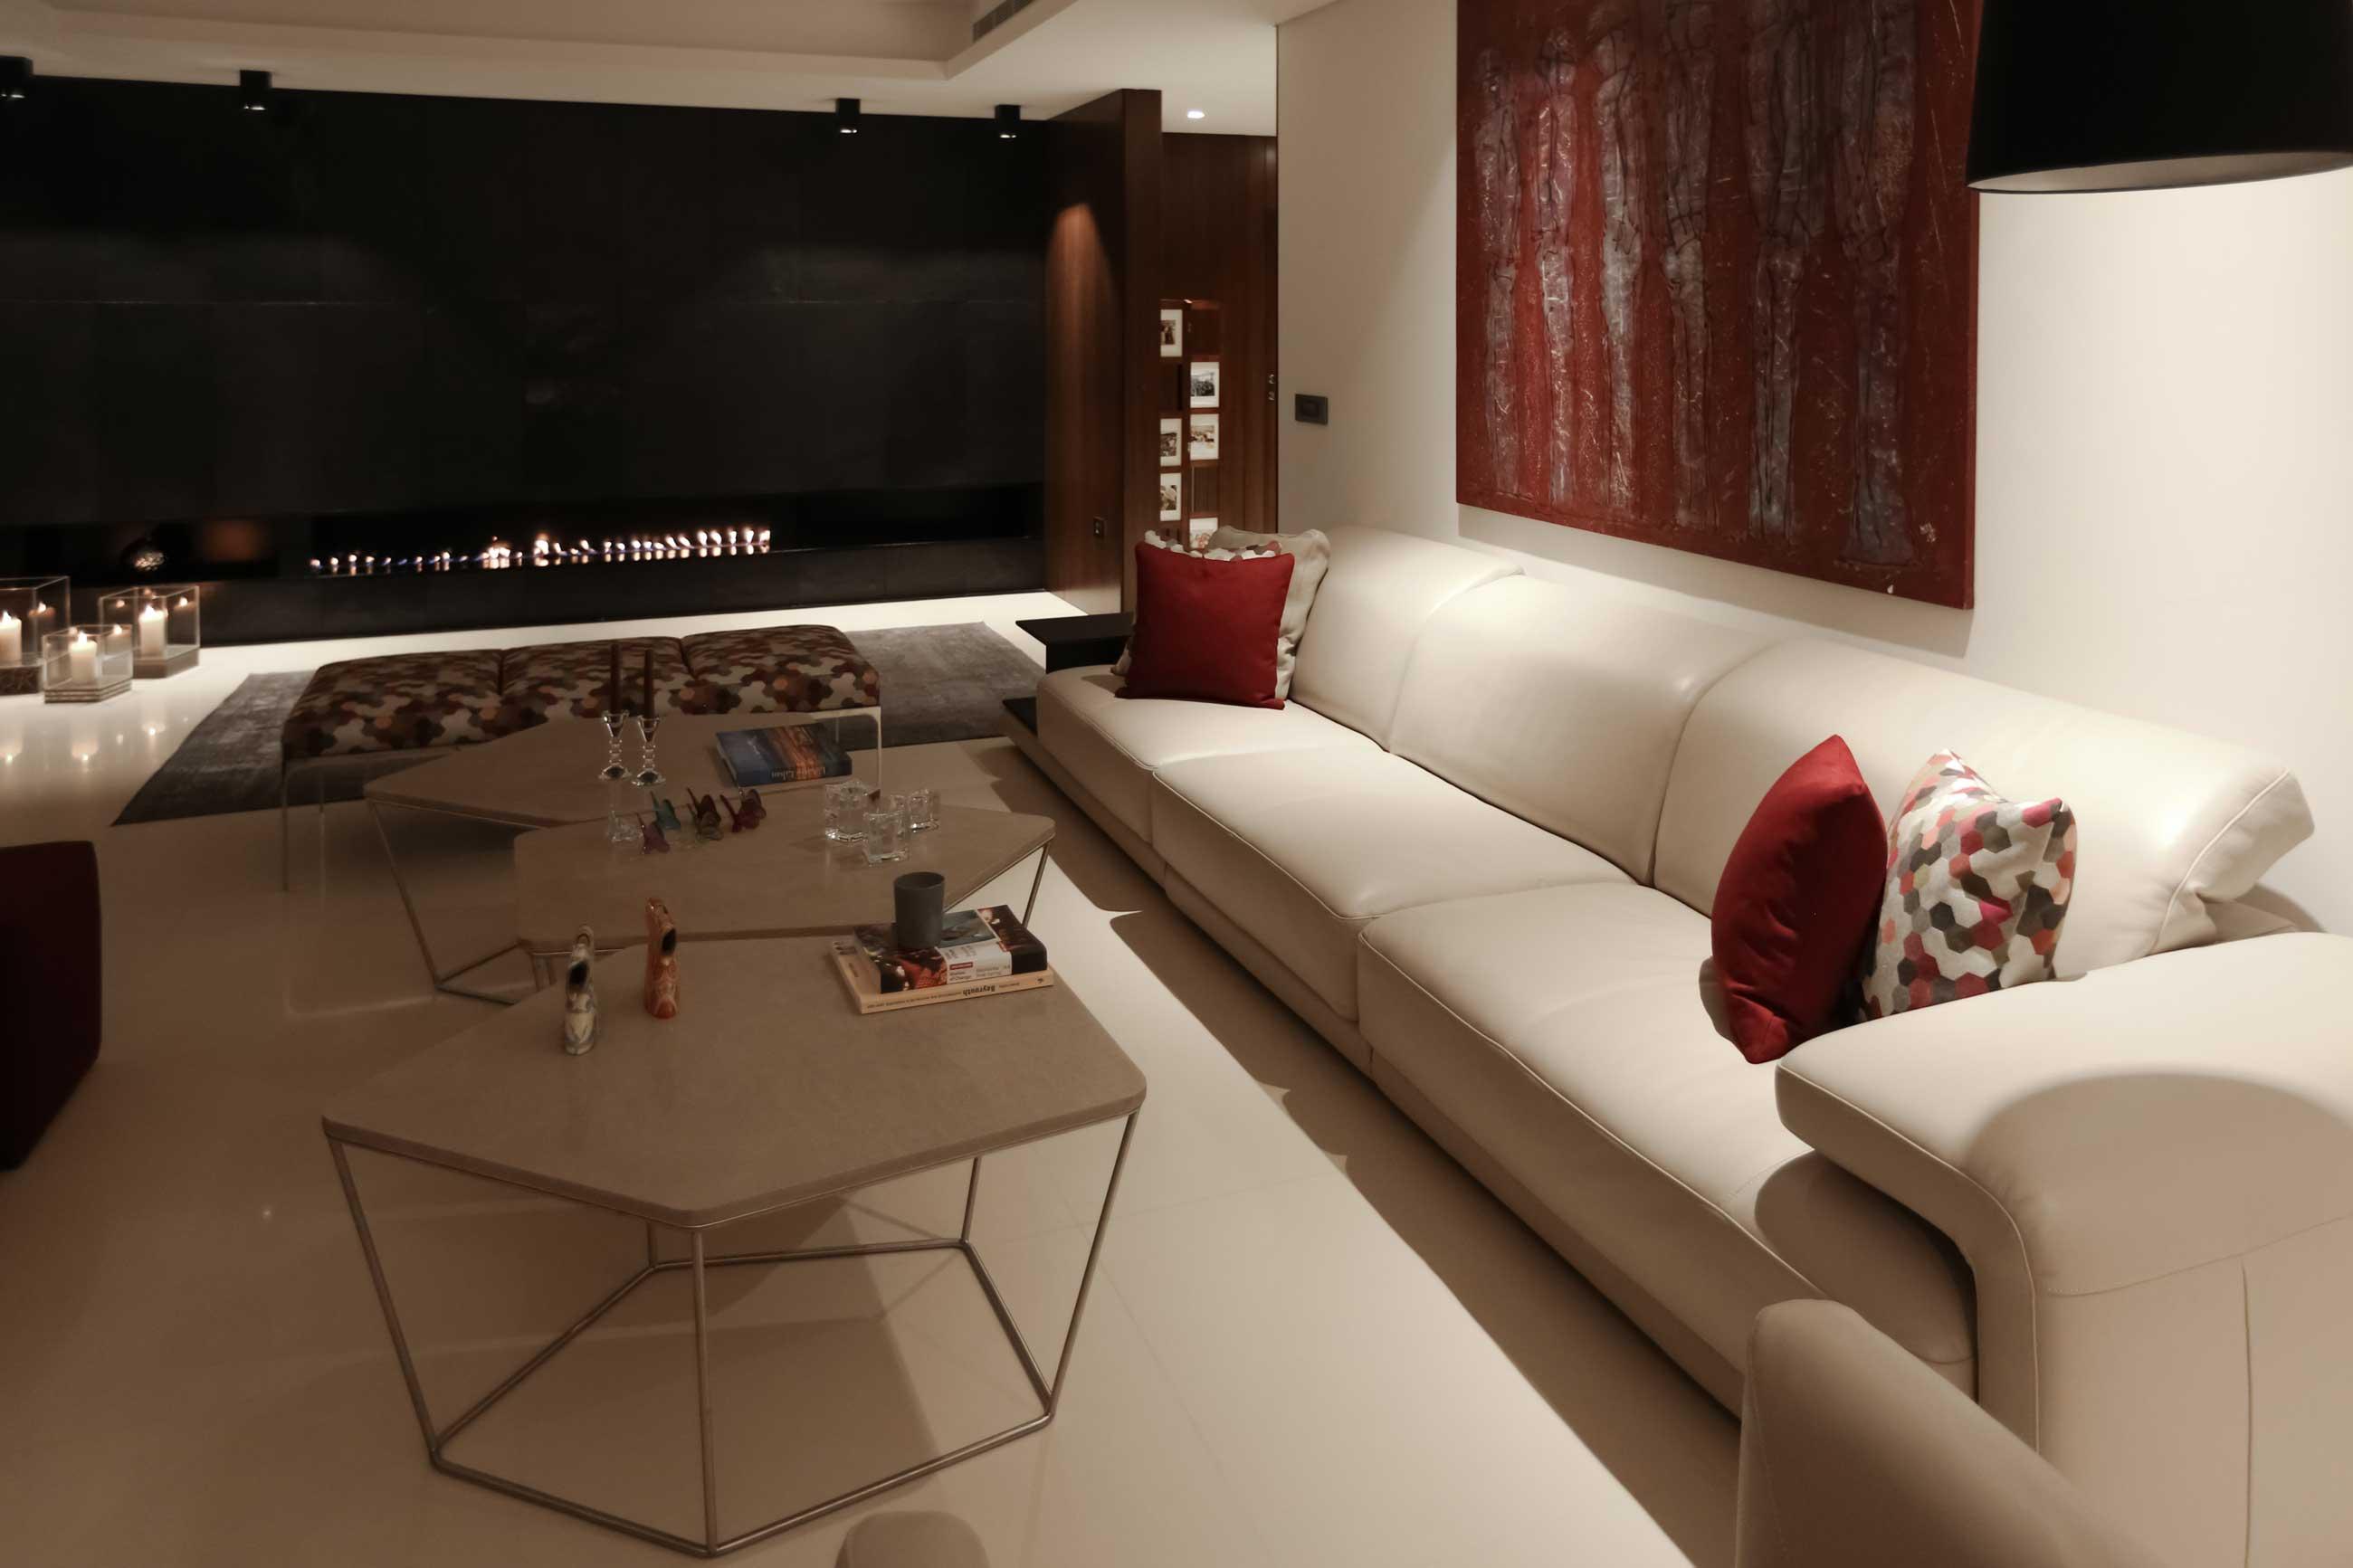 BDM R01 Stylish Apartment in Rabieh by ROHD-10